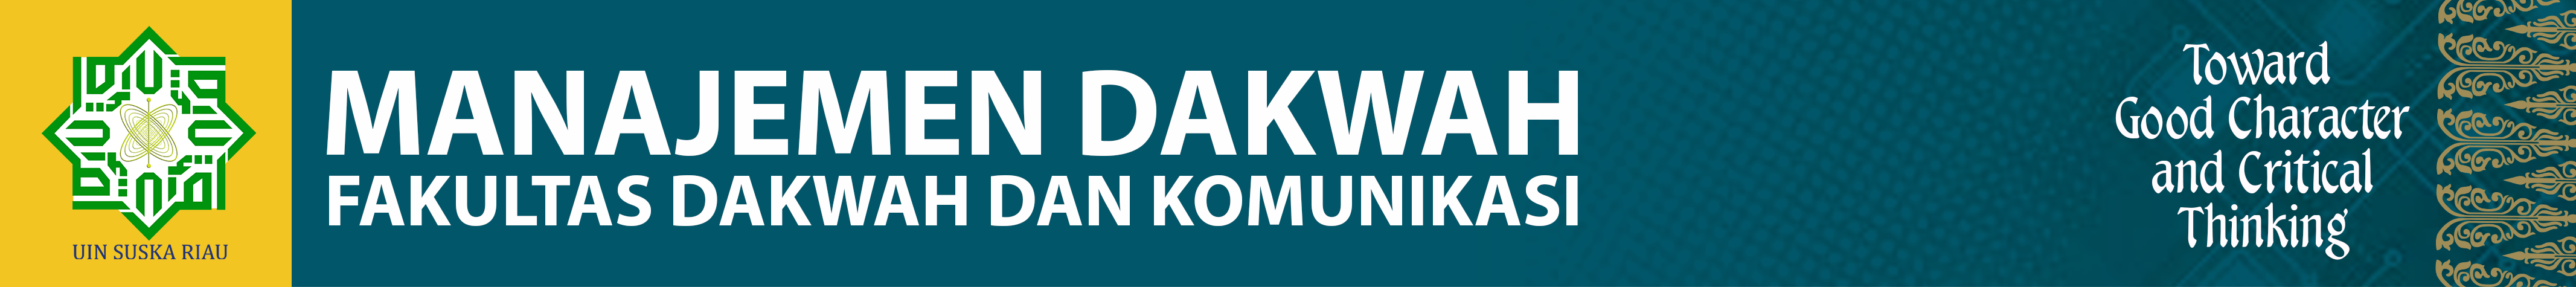 Prodi Manajemen Dakwah